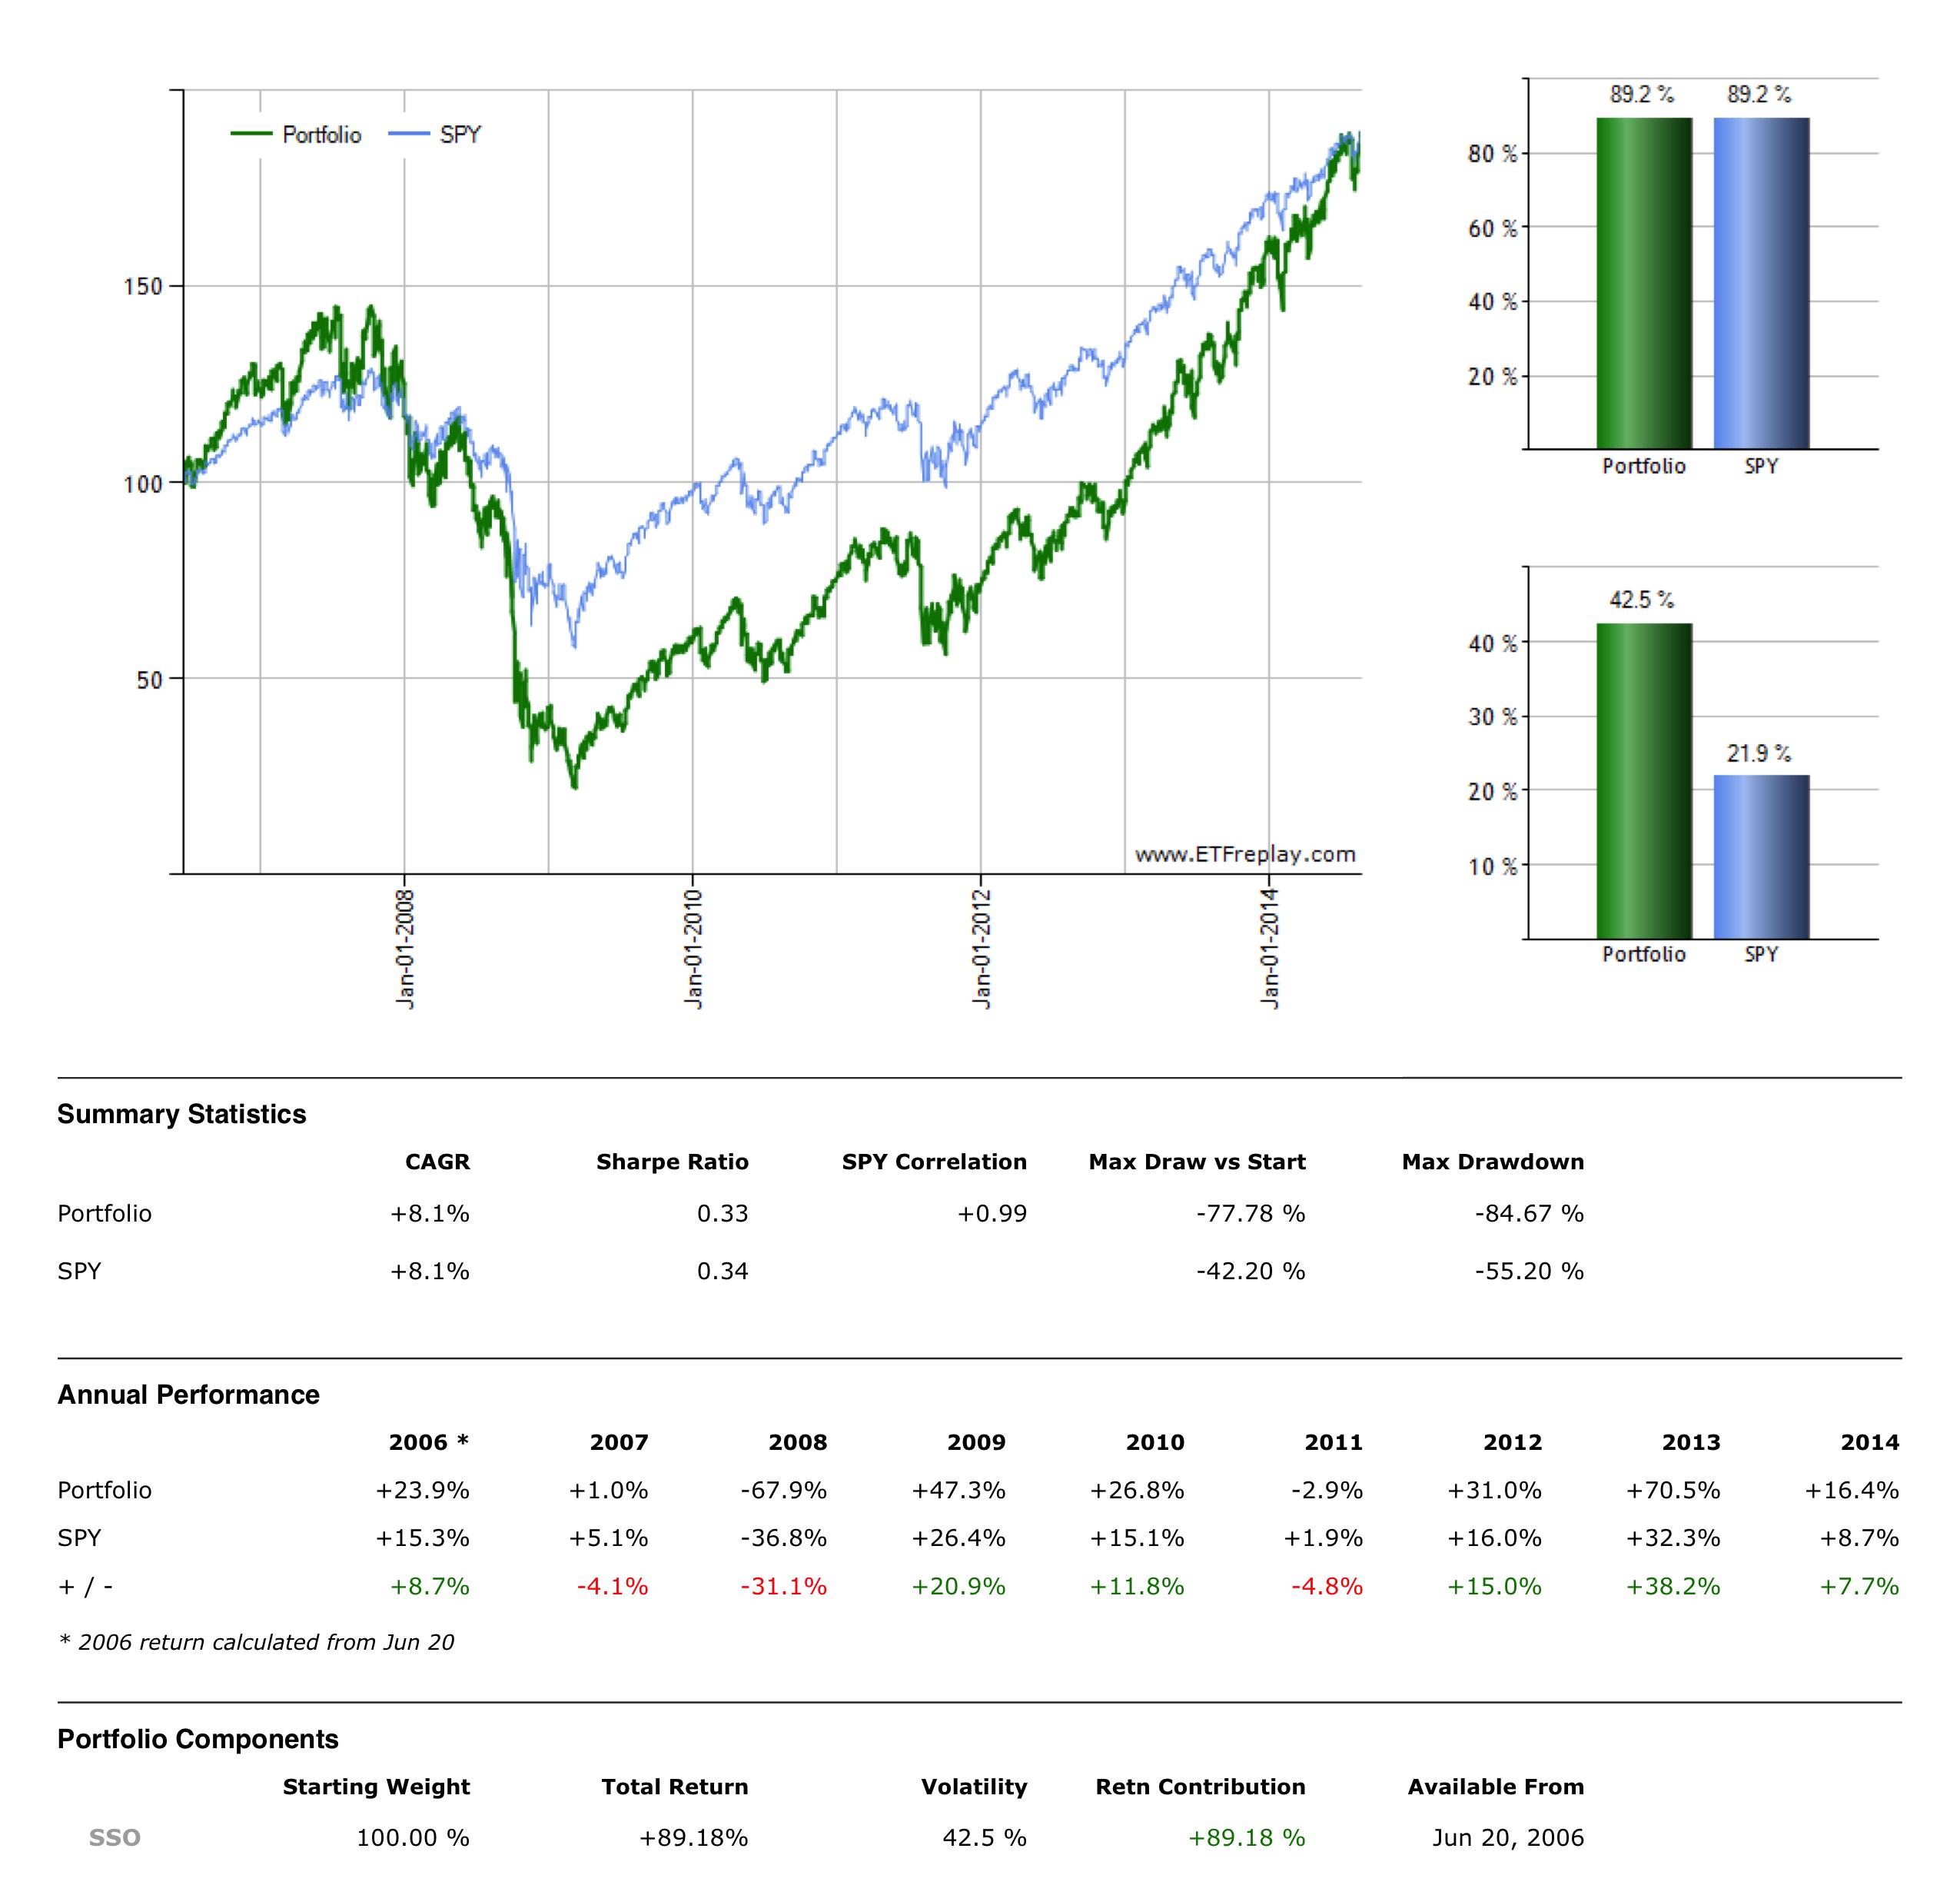 benefits of short selling inverse leveraged etfs seeking alpha